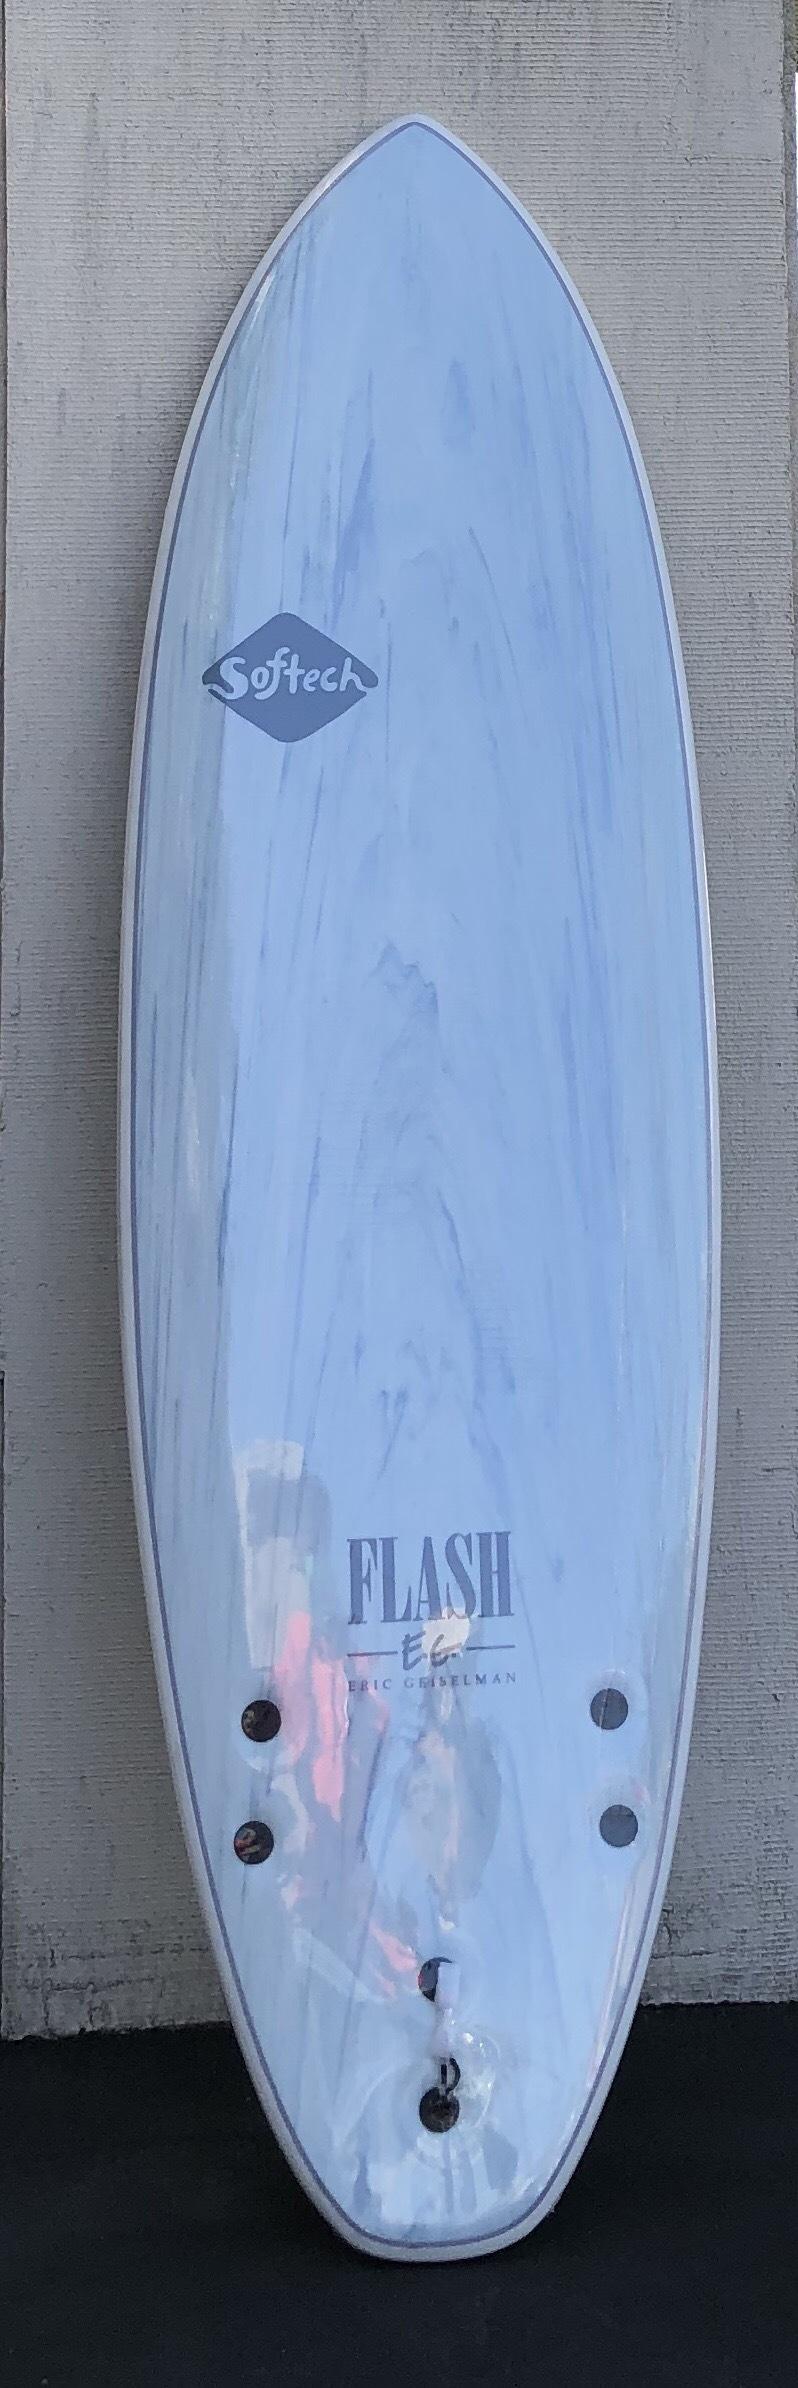 2020 SOFTECH FLASH E.GEISELMAN 6'0''ソフテック サーフボード